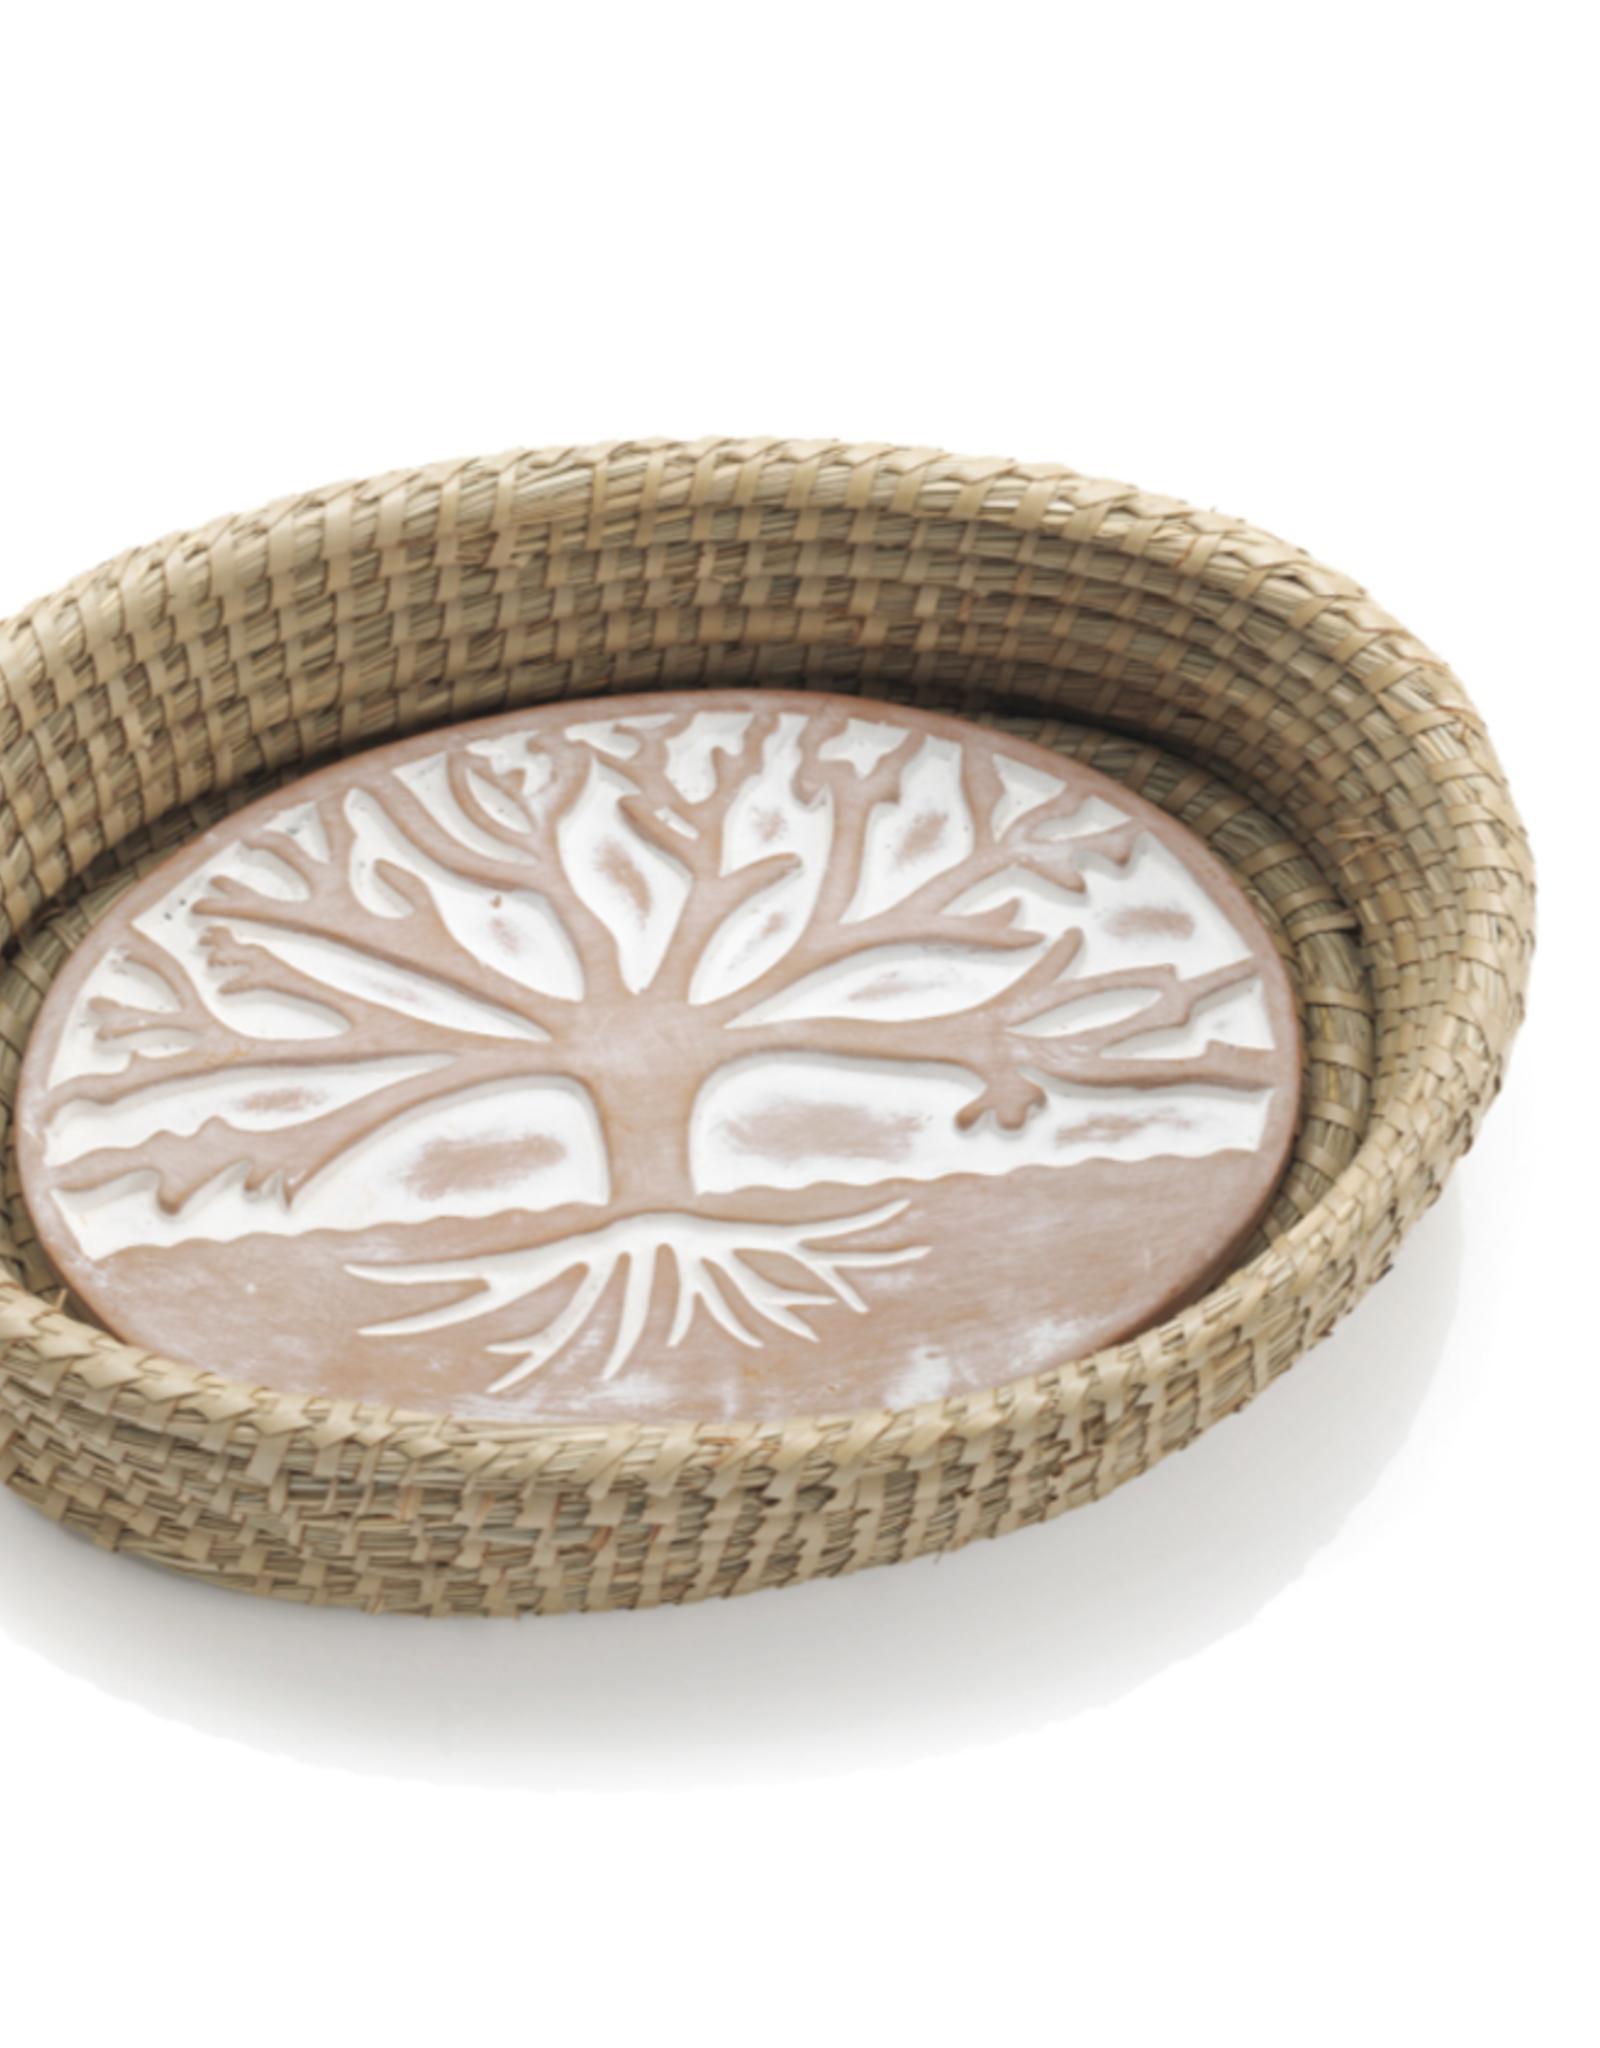 Tree of Life Bread Warmer